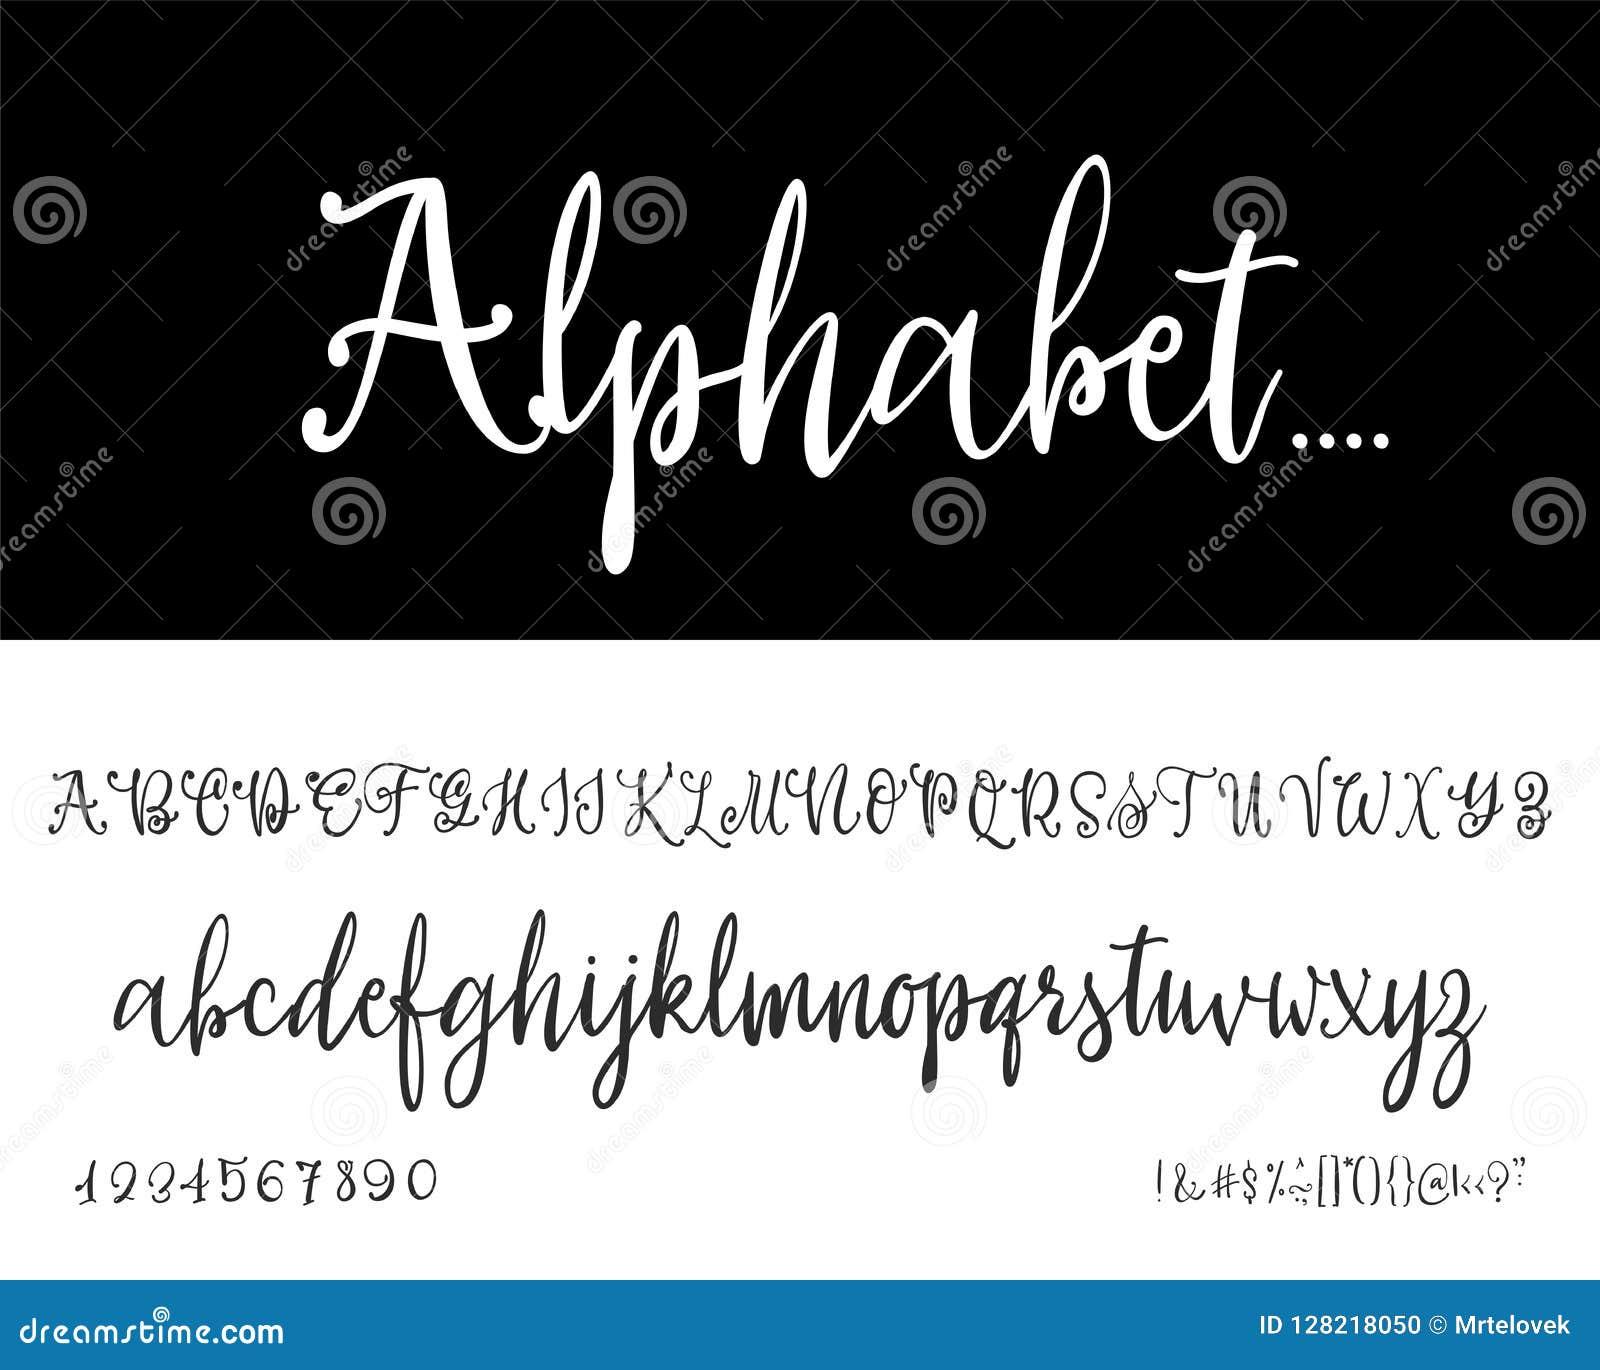 Modern Calligraphy Vintage Handwritten Vector Font For